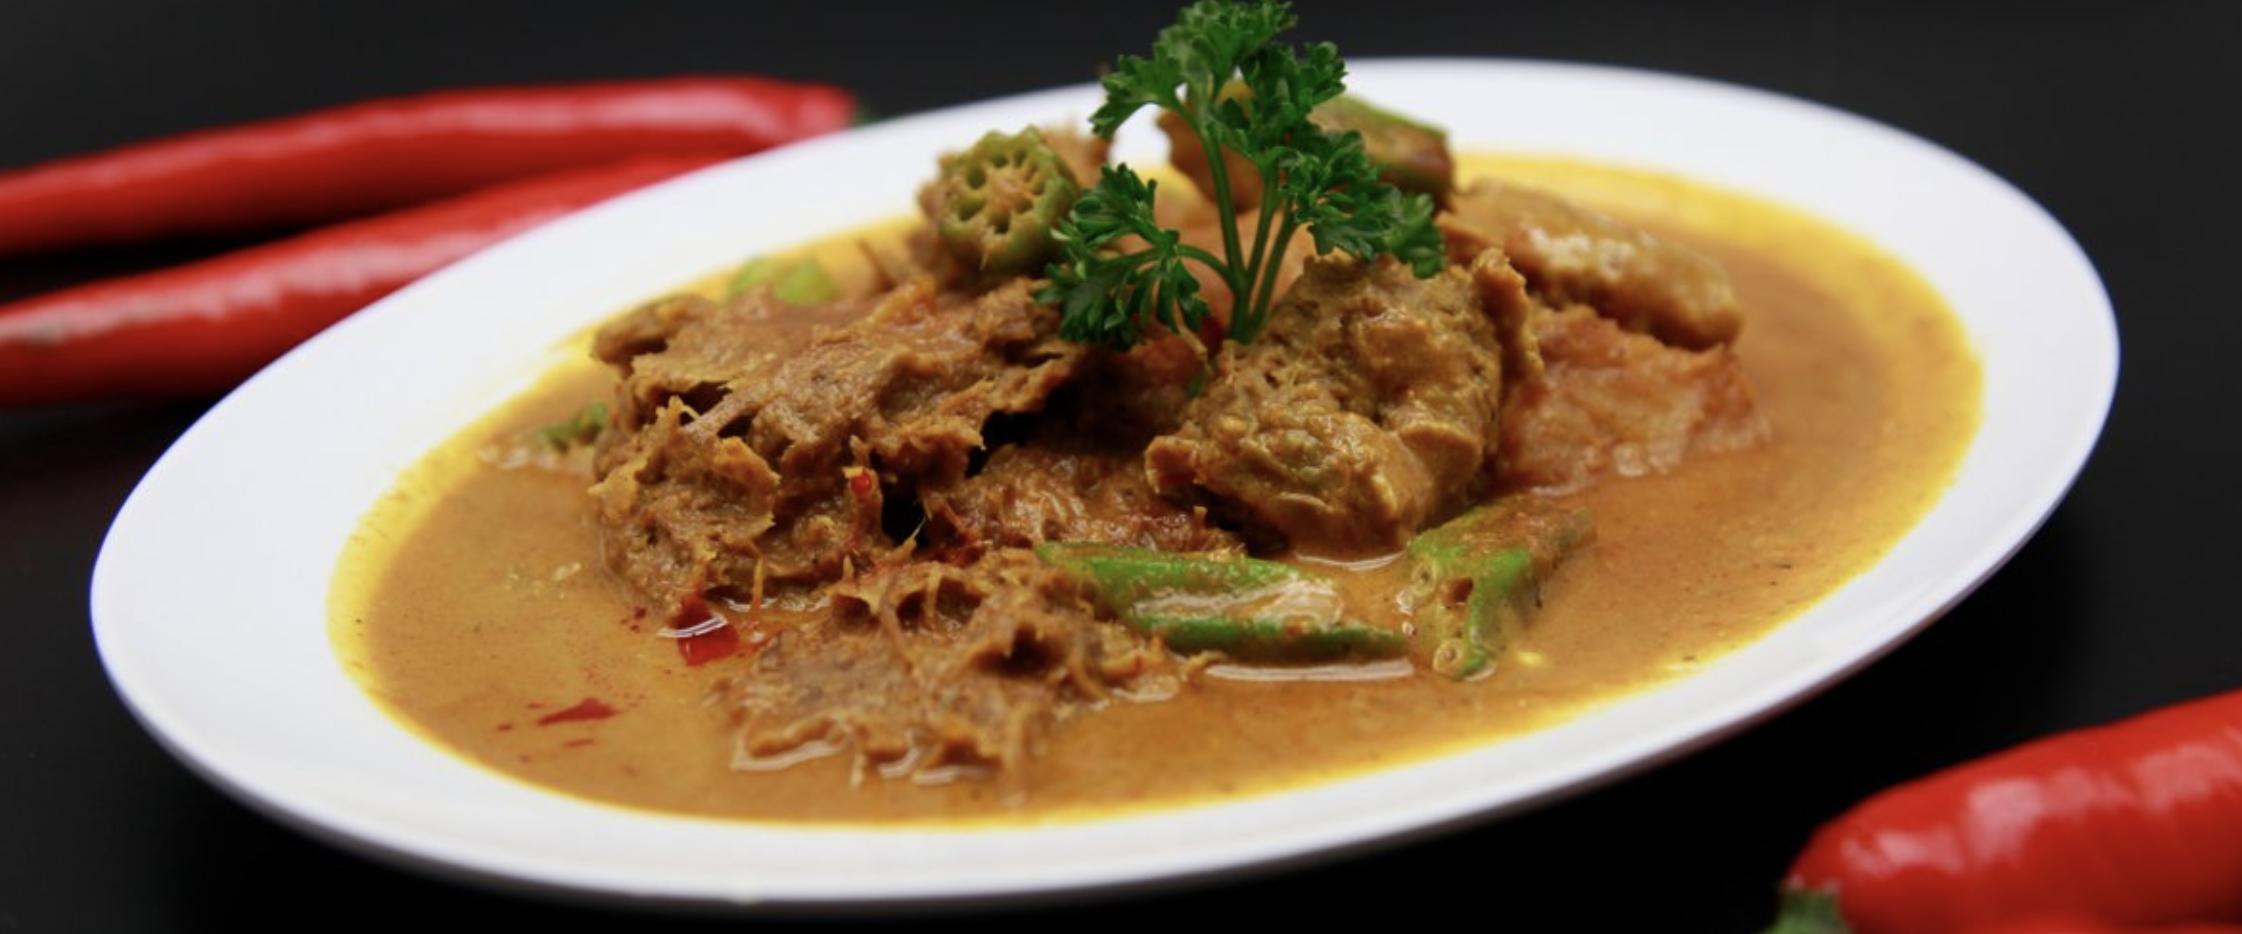 Photo courtesy: Miao Yi Vegetarian Restaurant